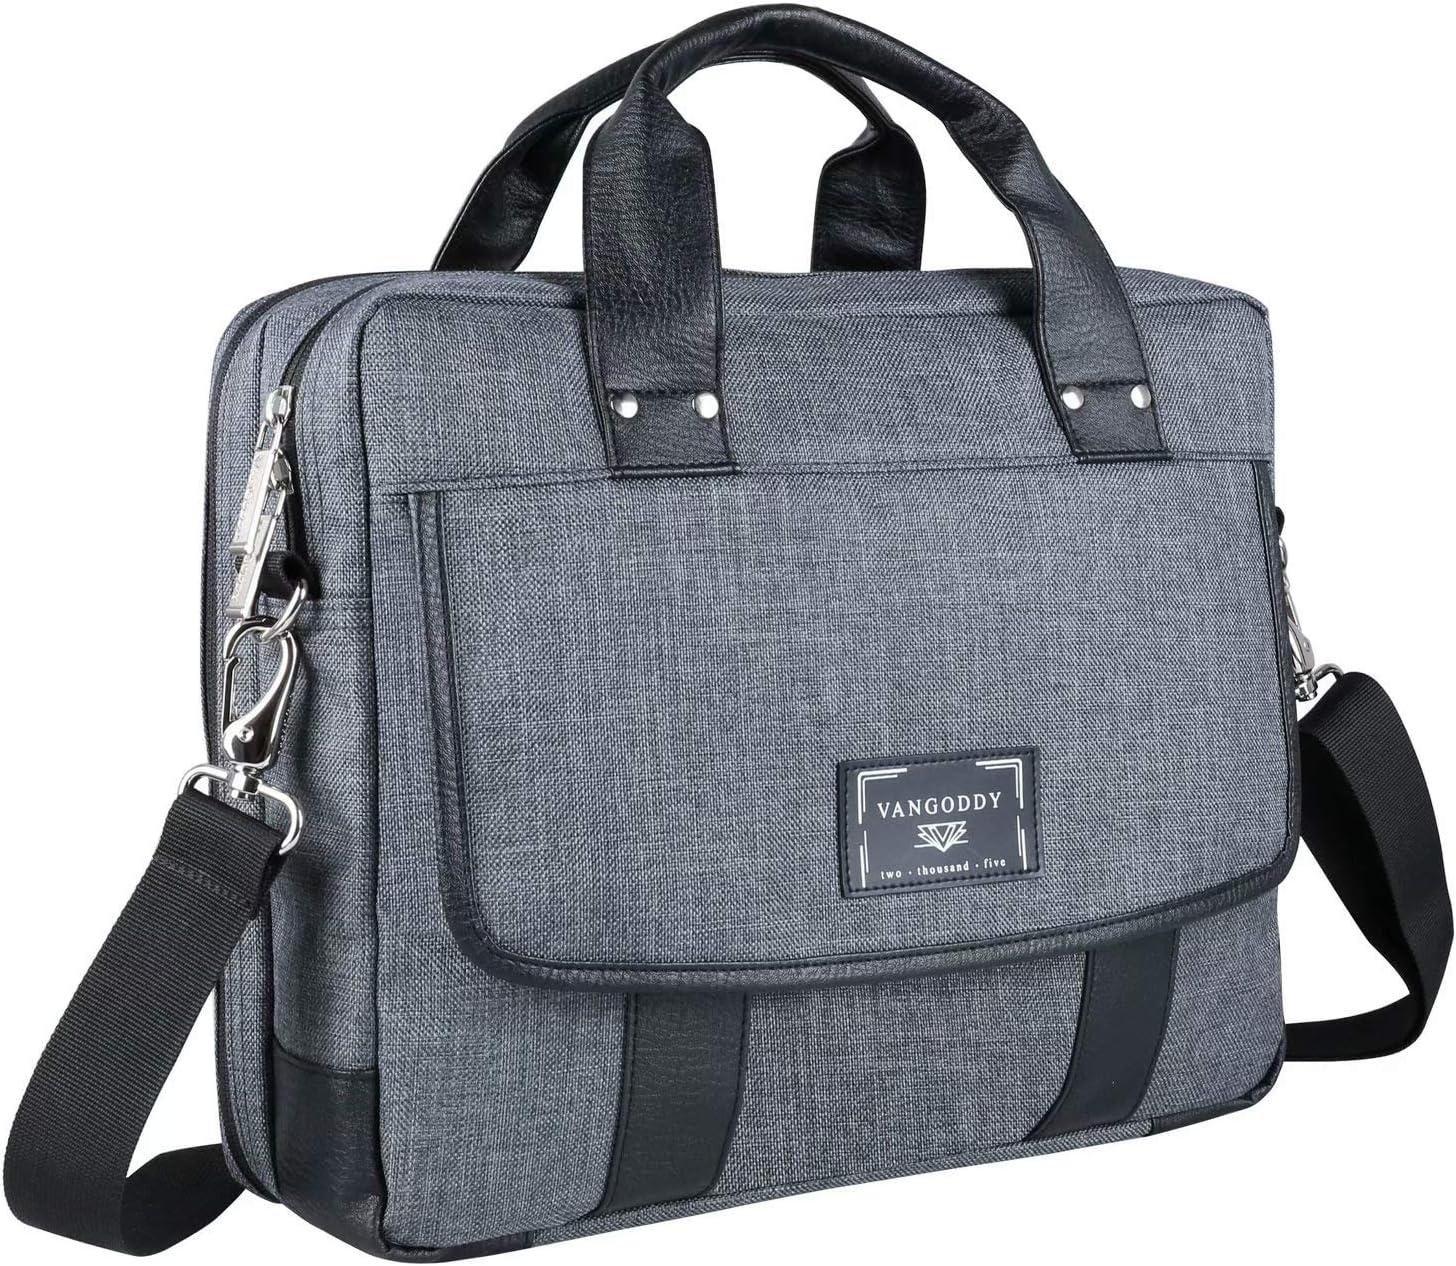 14 Inch Laptop Albuquerque Mall Messenger Bag for 3310 5400 Dell Latitude 3410 Mesa Mall